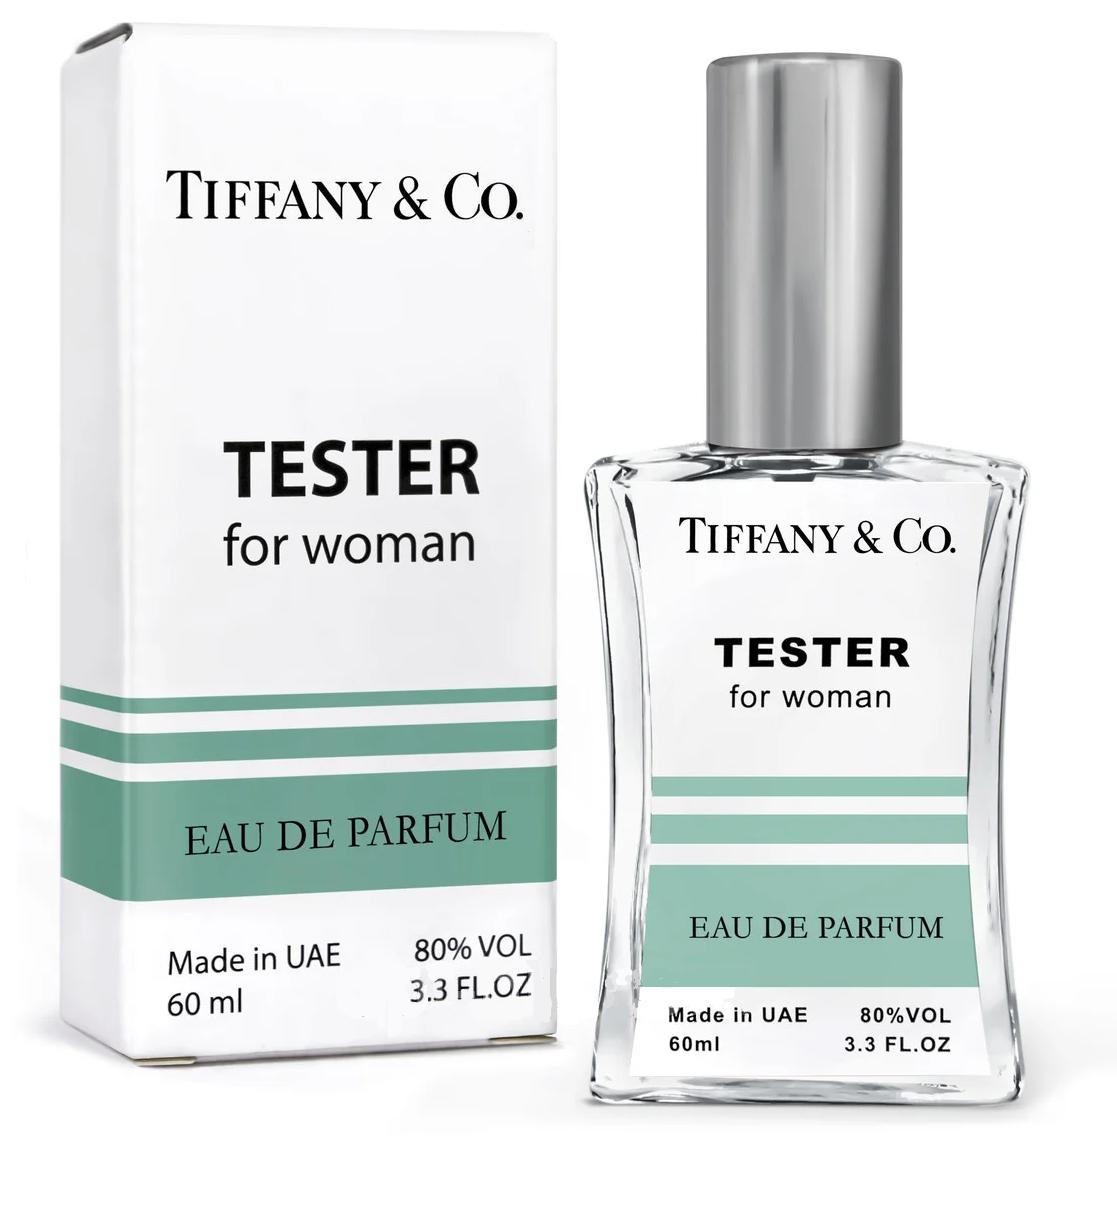 Тестер Tiffany & Co Eau De Parfum женский, 60 мл